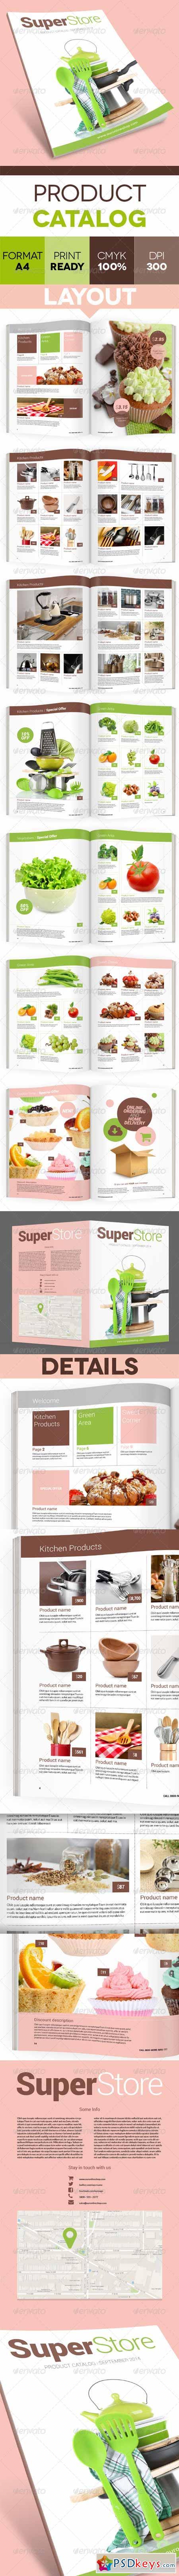 Modern Product Catalog 8232692